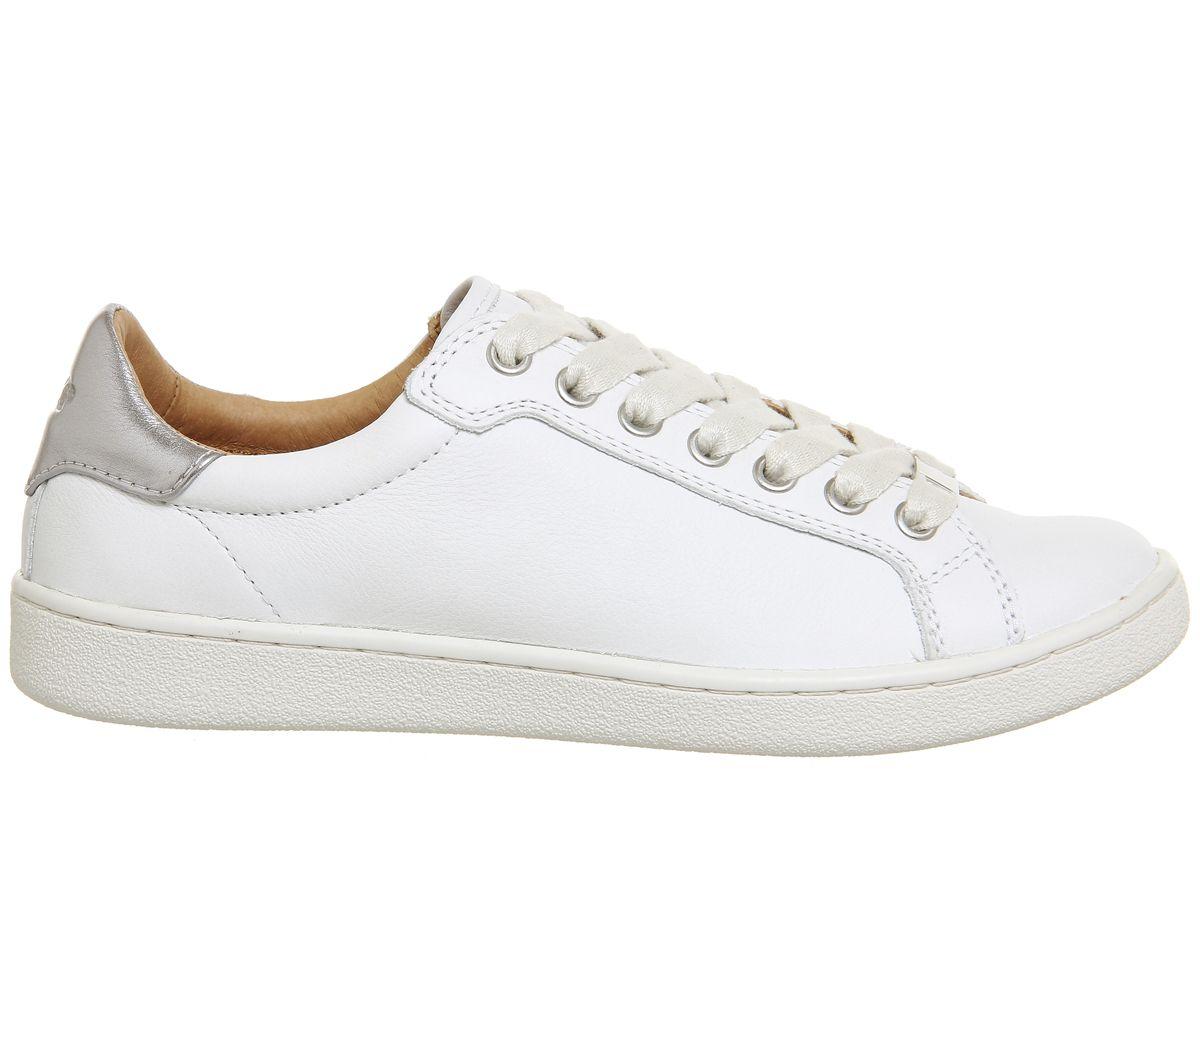 269b7db12c7 Milo Sneakers